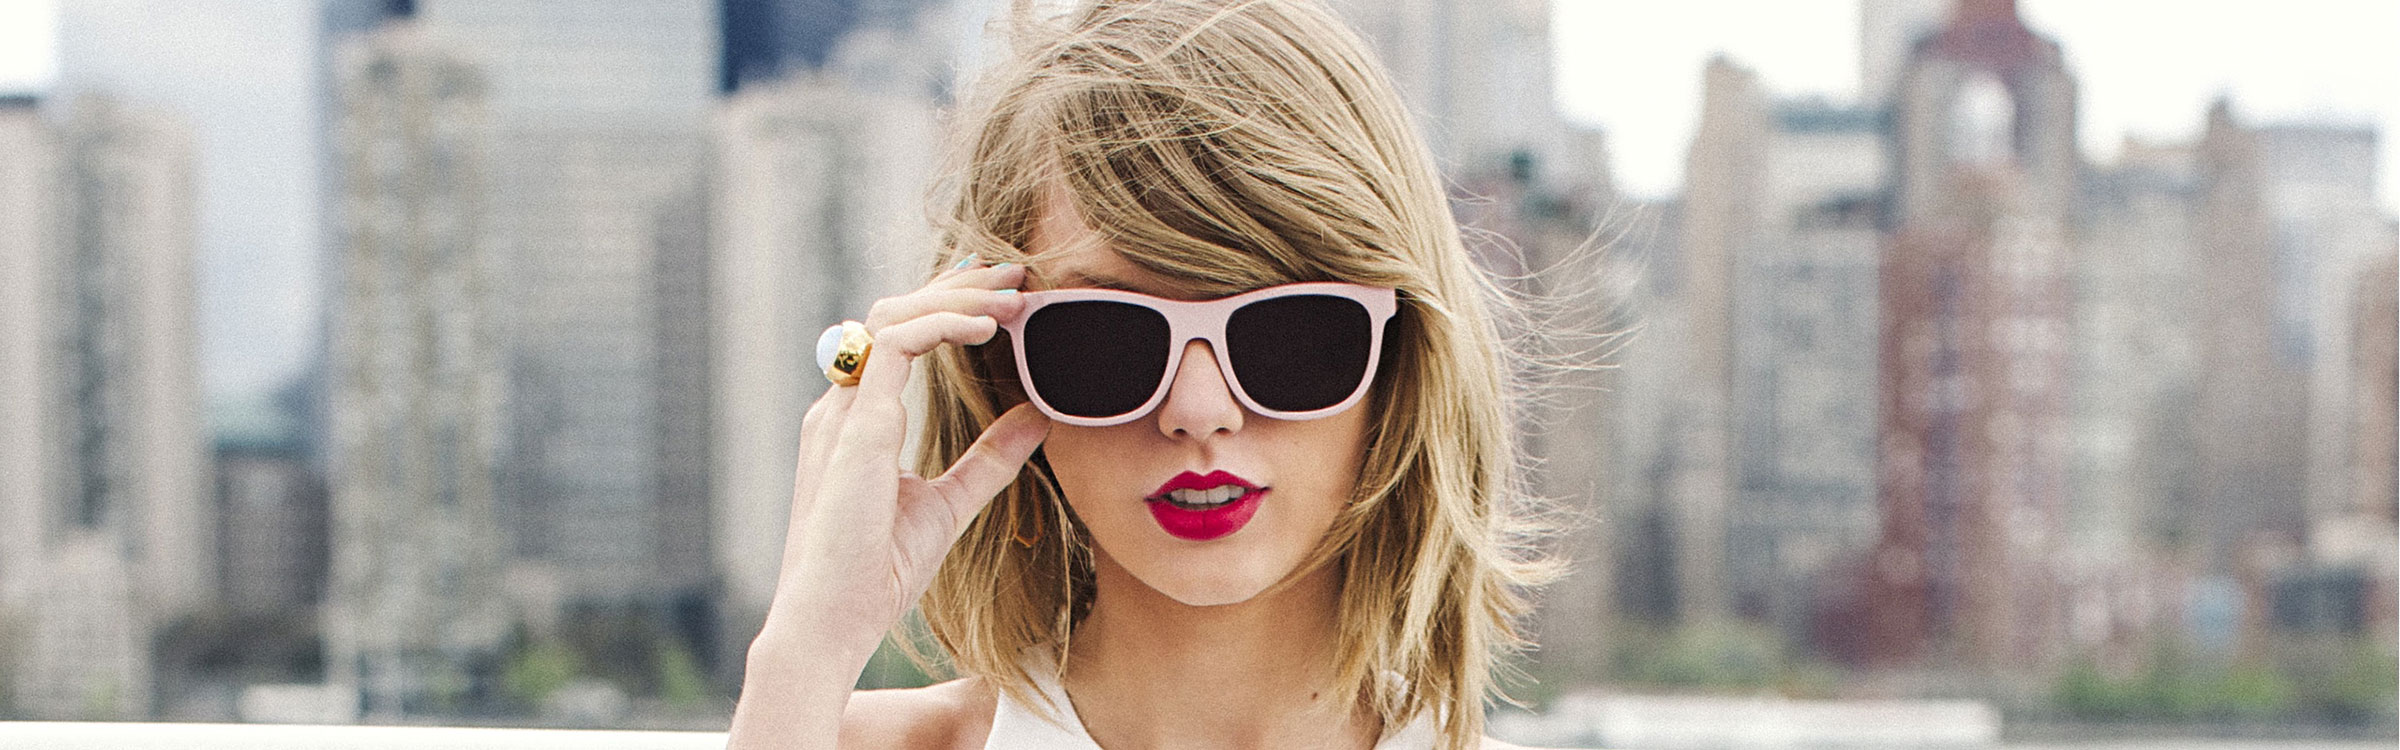 Taylor swift 009